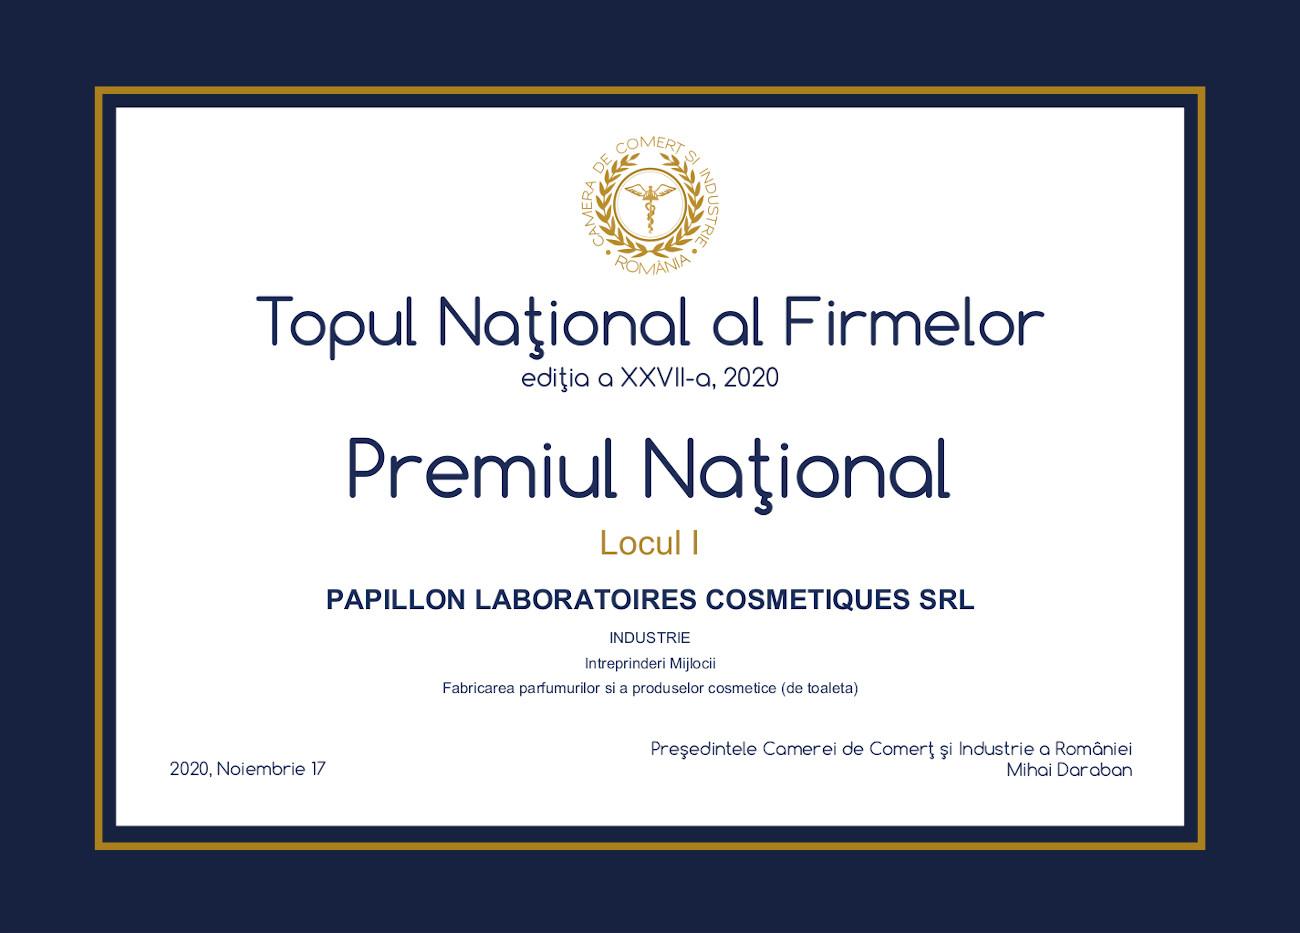 Diploma Papillon Laboratoires Cosmetiques